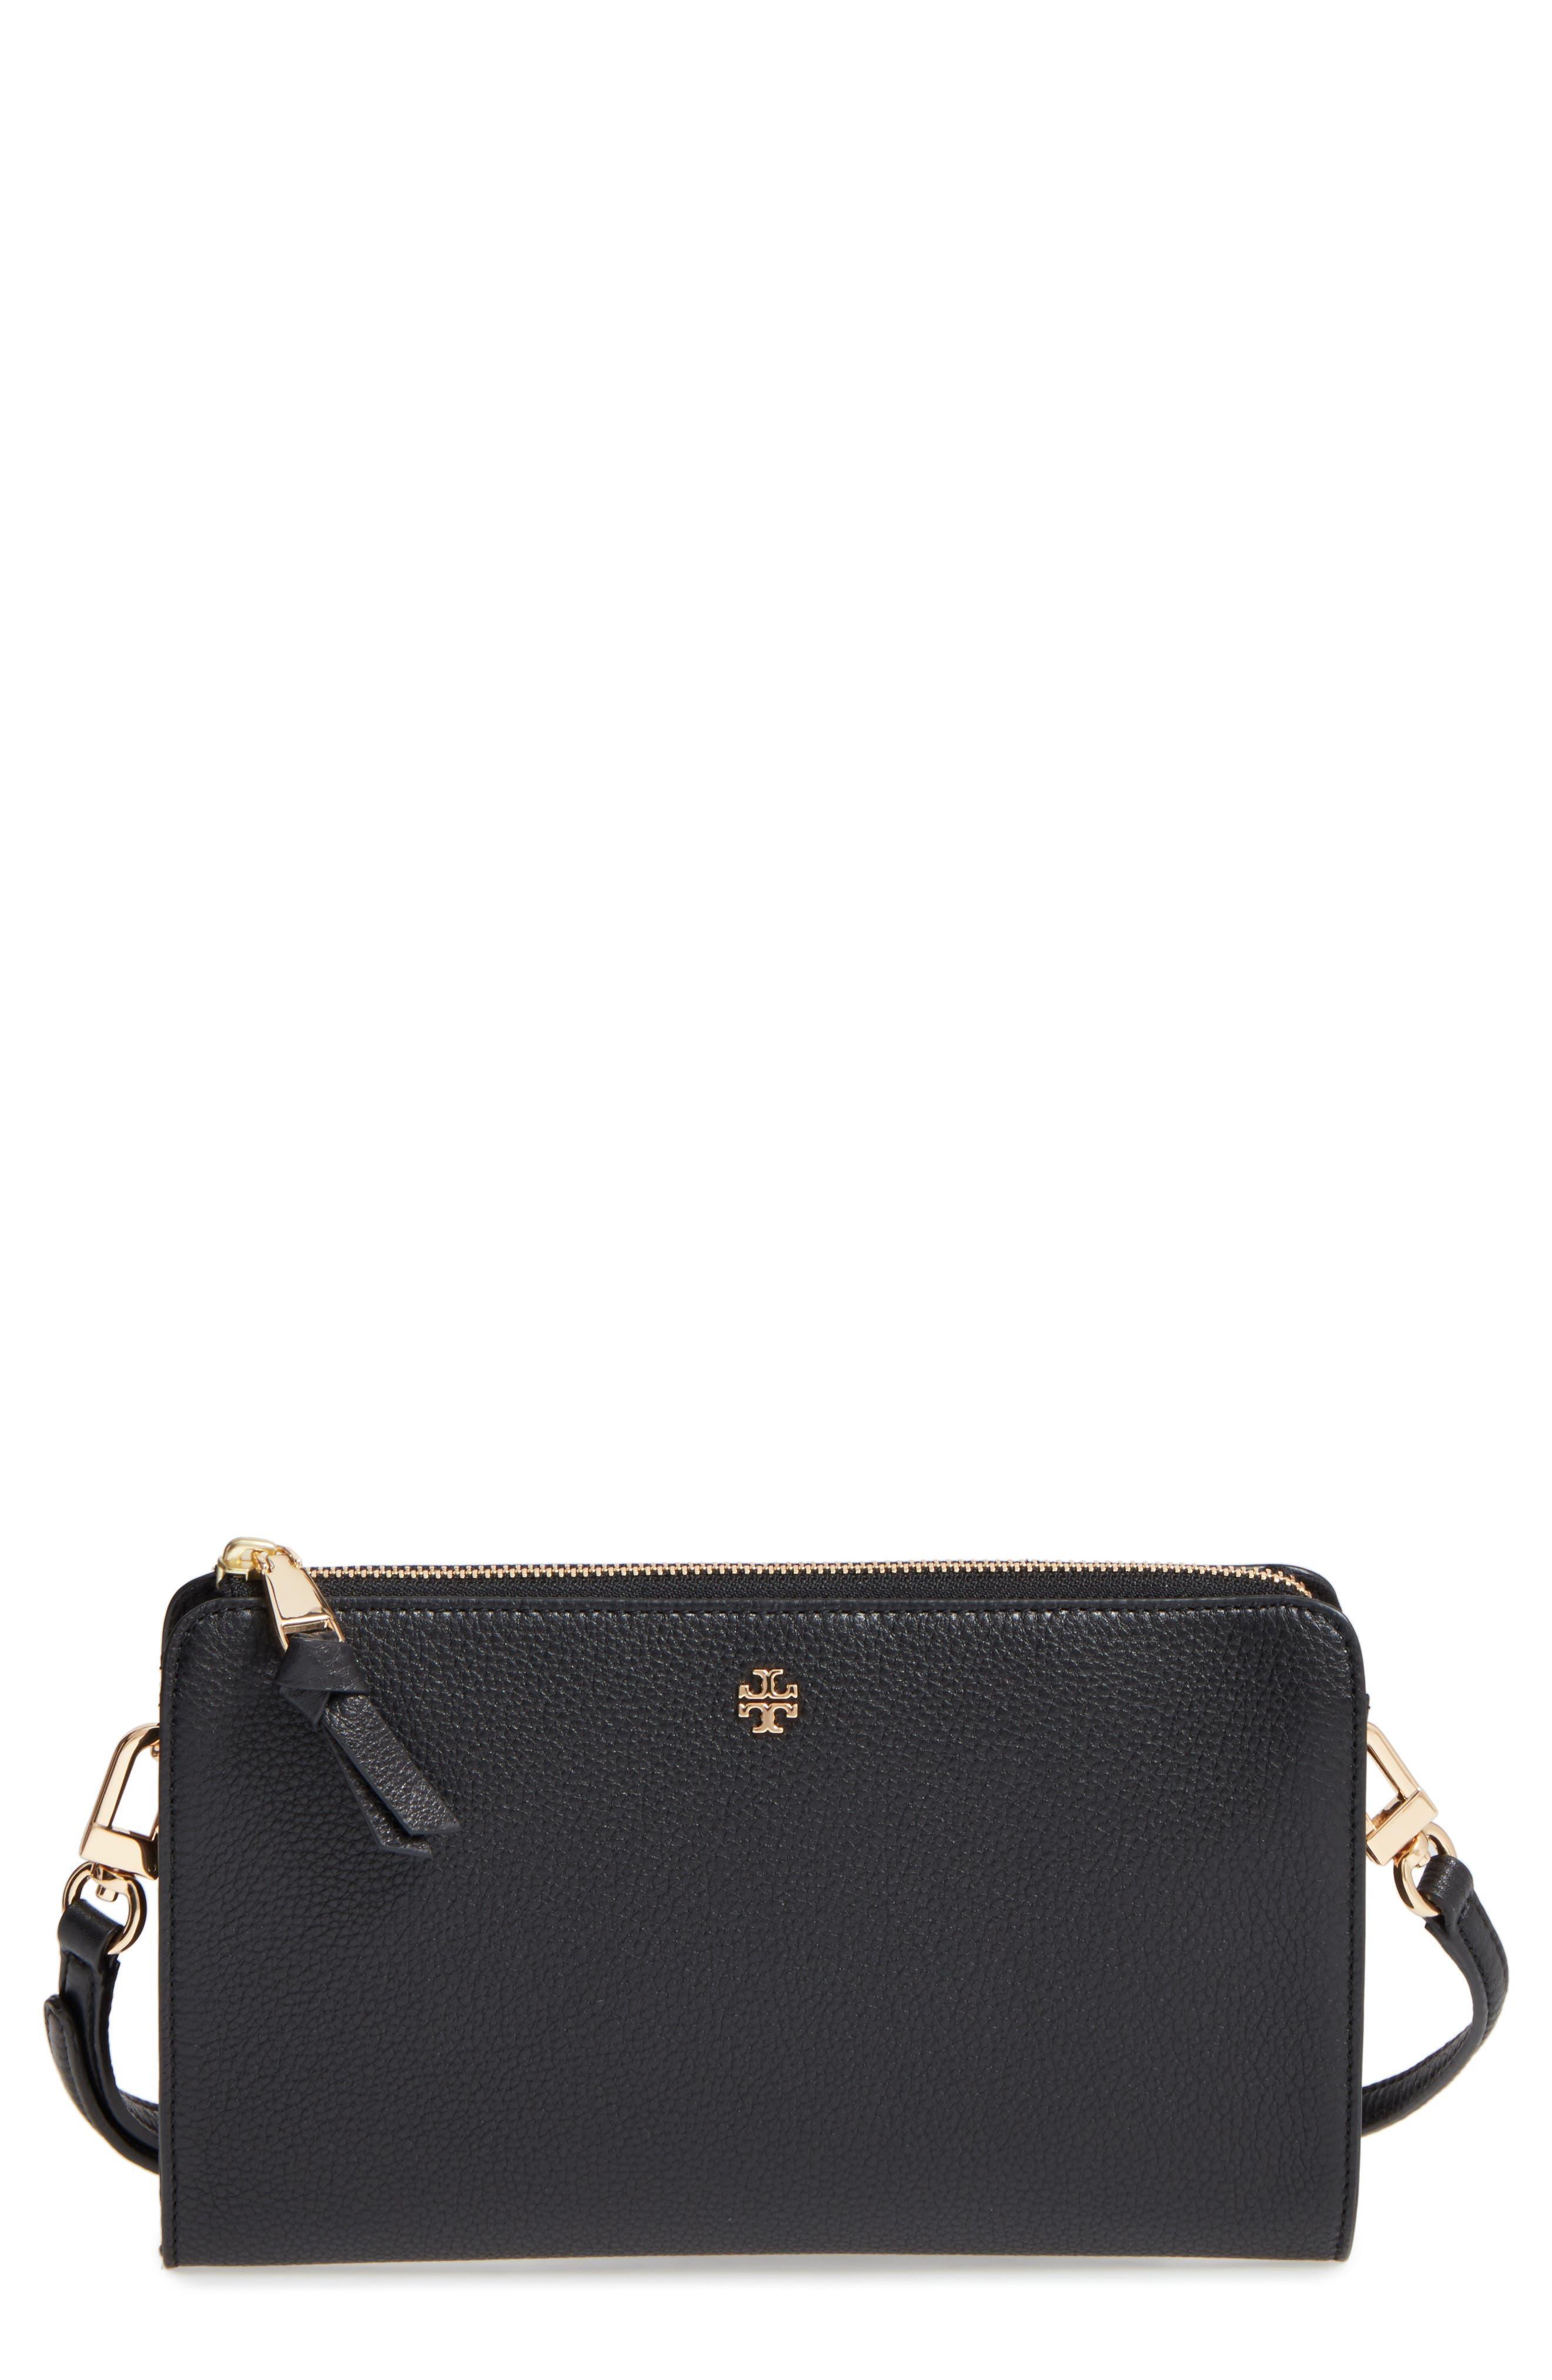 Robinson Leather Wallet/Crossbody Bag,                             Main thumbnail 1, color,                             Black